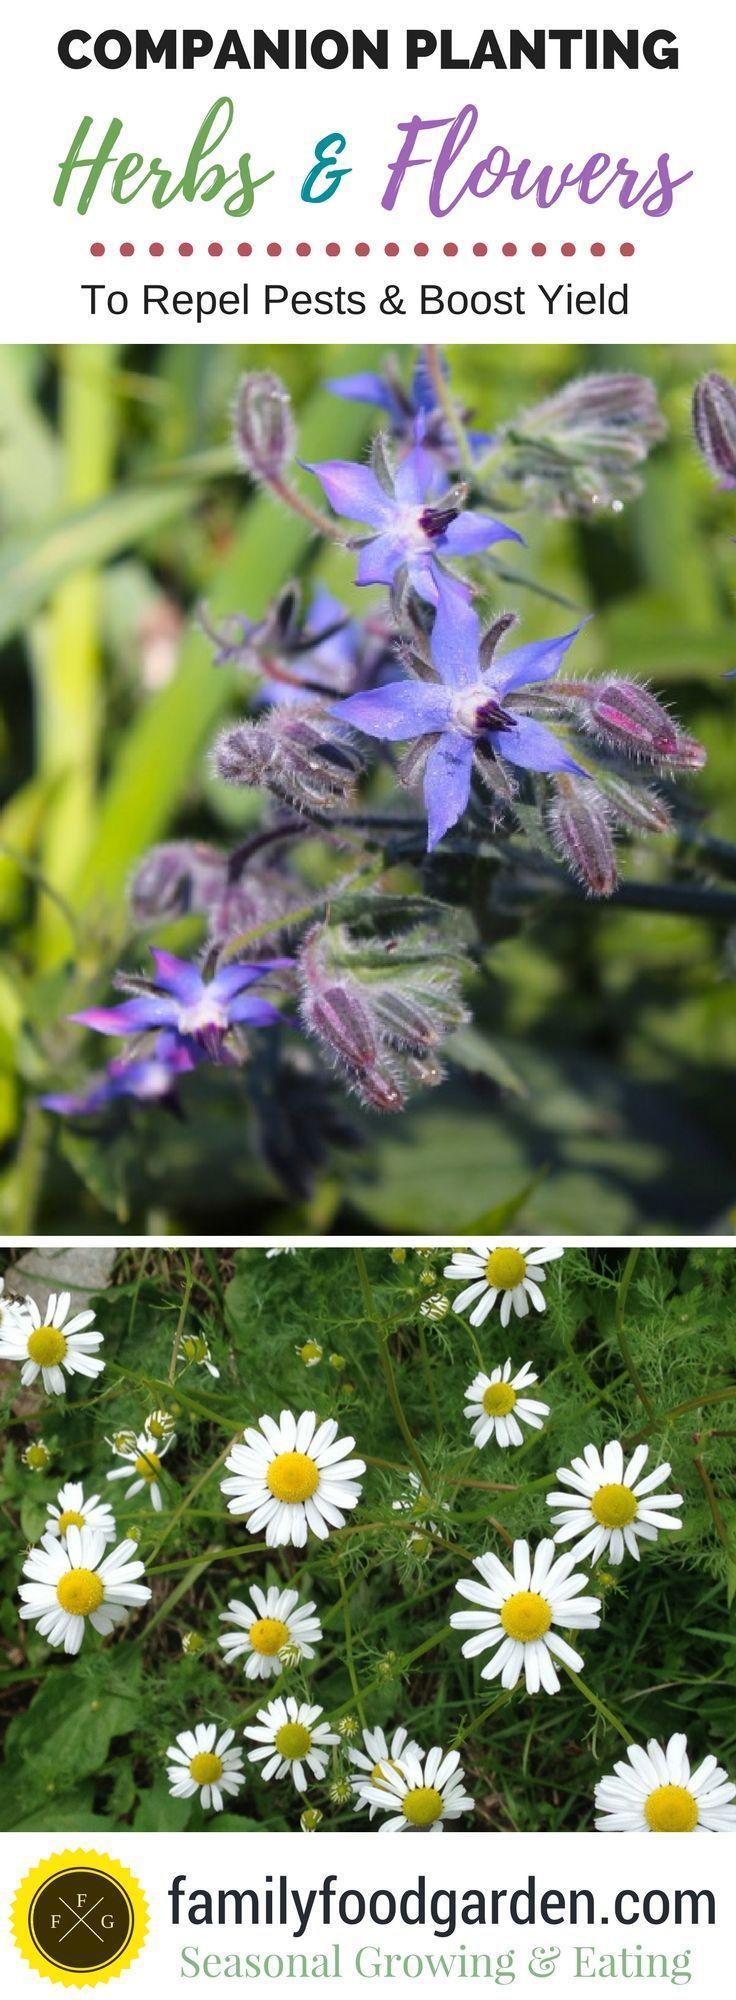 Compantion Planting Tips